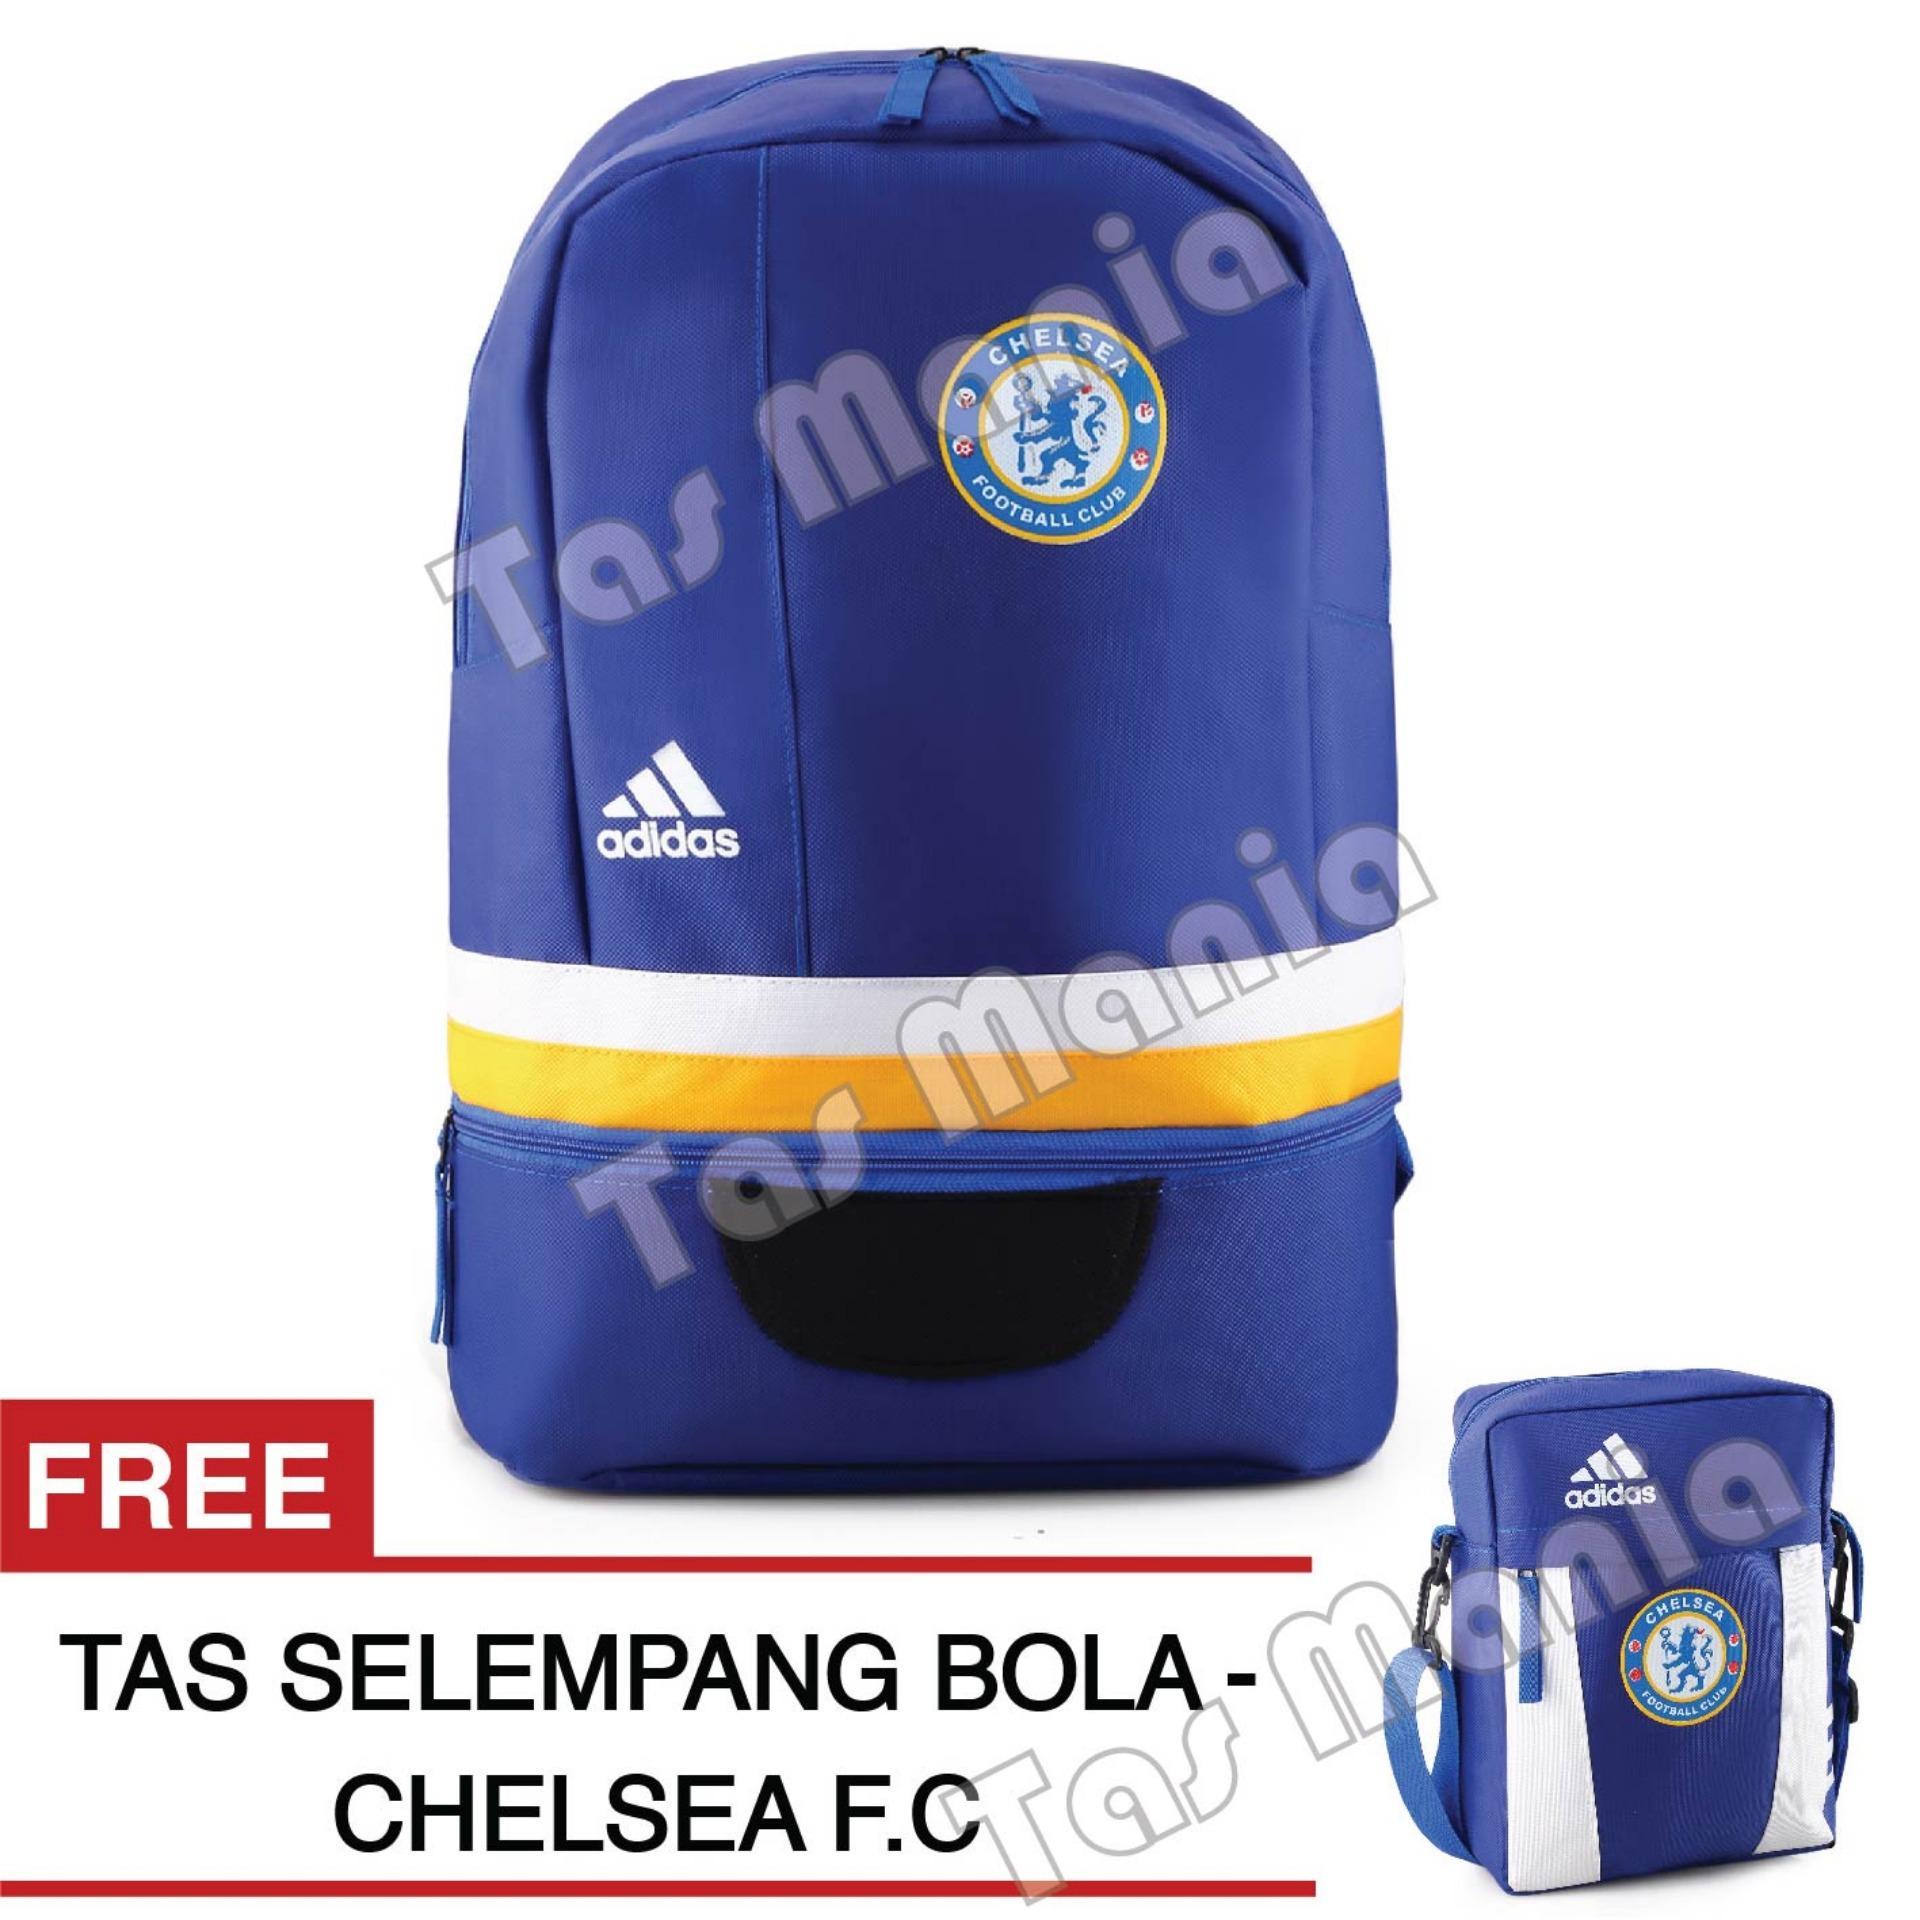 Tas Ransel Adidas Bola Pria Chelsea FC Laptop Backpack Men Soccer Editions - Blue + Raincover + FREE Tas Selempang Chelsea FC - Blue